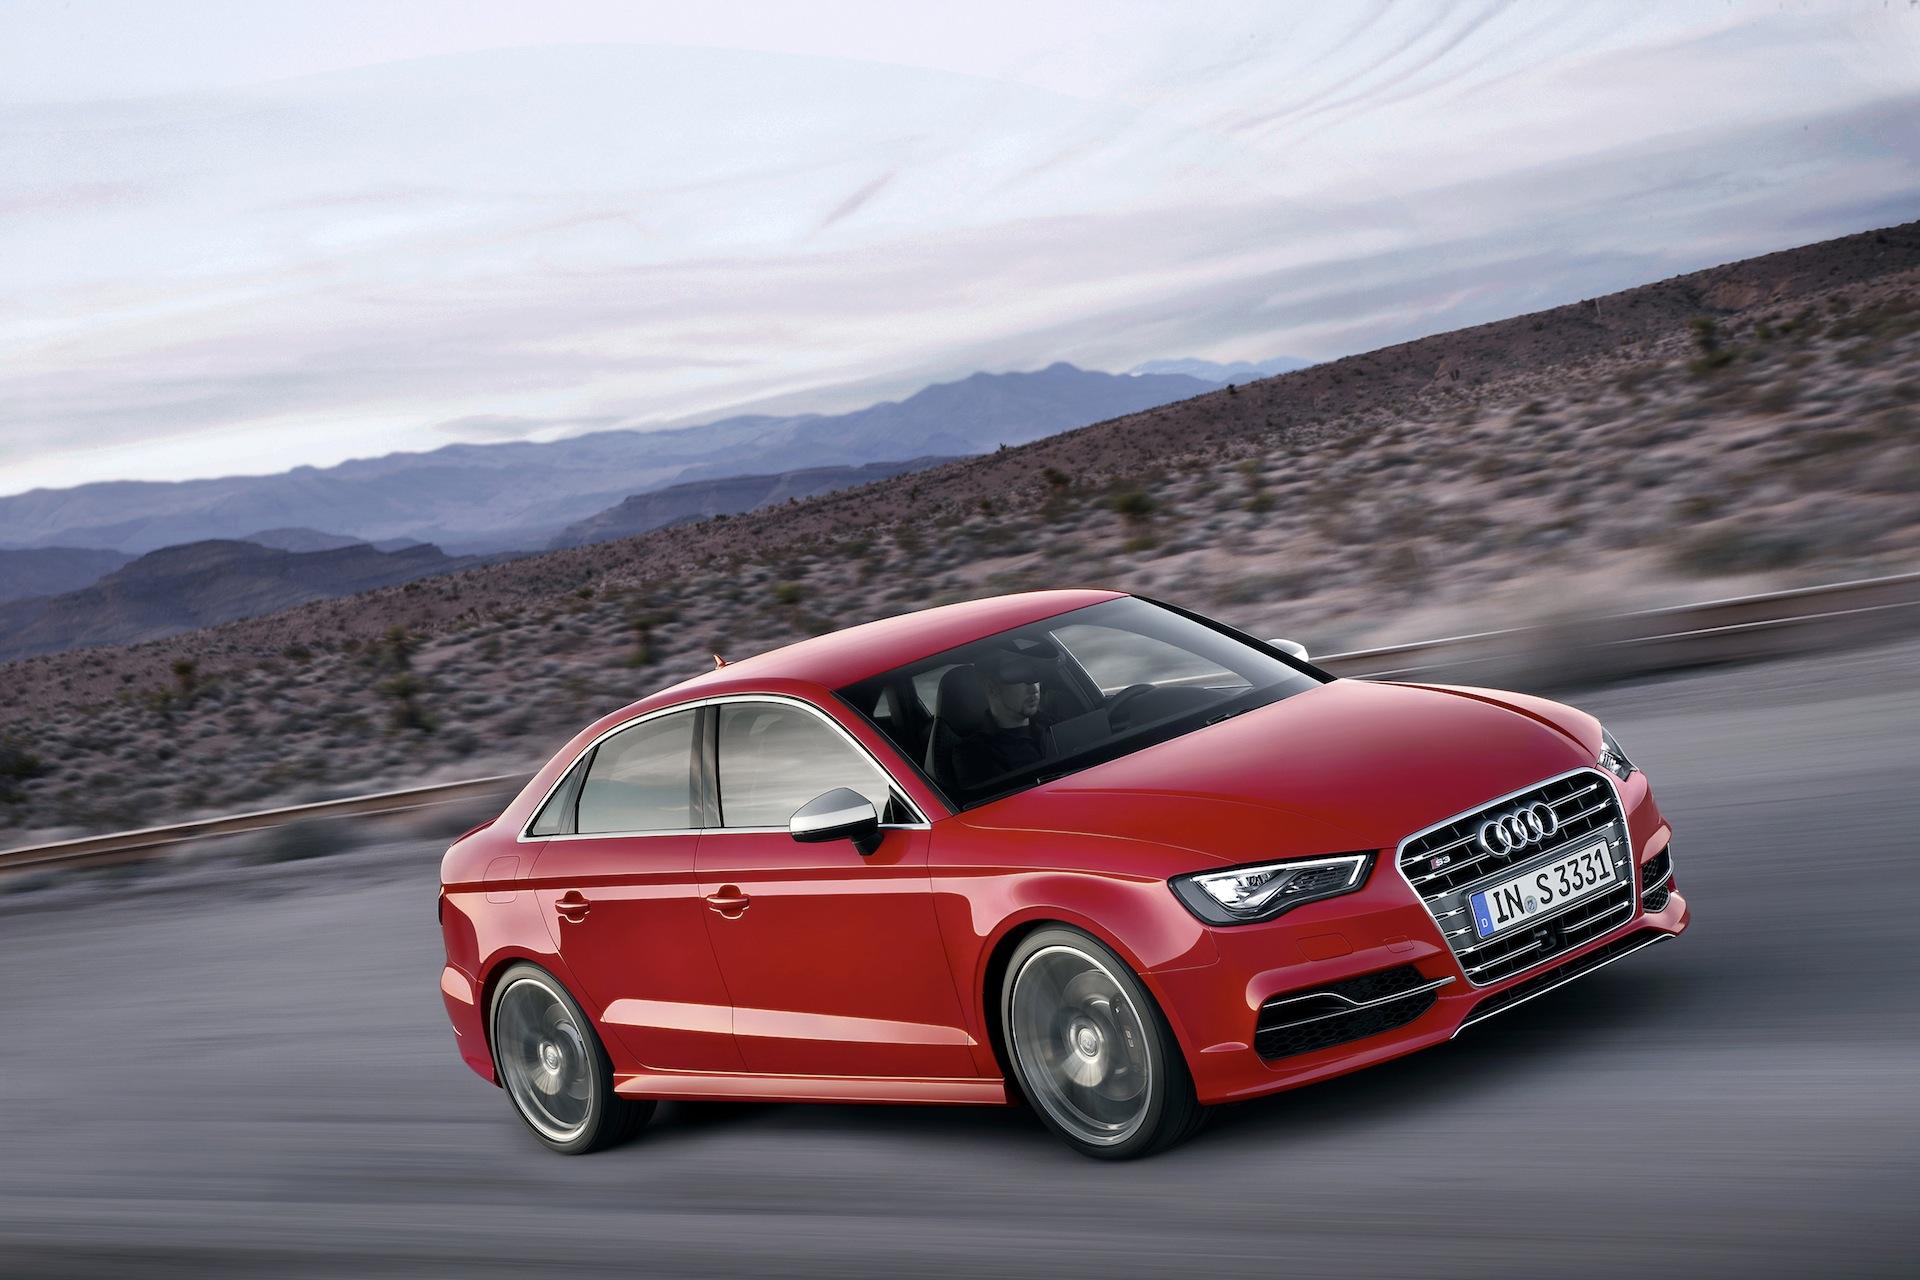 Audi Prices 2015 A3 TDI, A3 Cabriolet, High-Performance S3 on 2015 audi s3, samsung s4 vs s3, audi s3 sportback, audi r8 wallpaper,